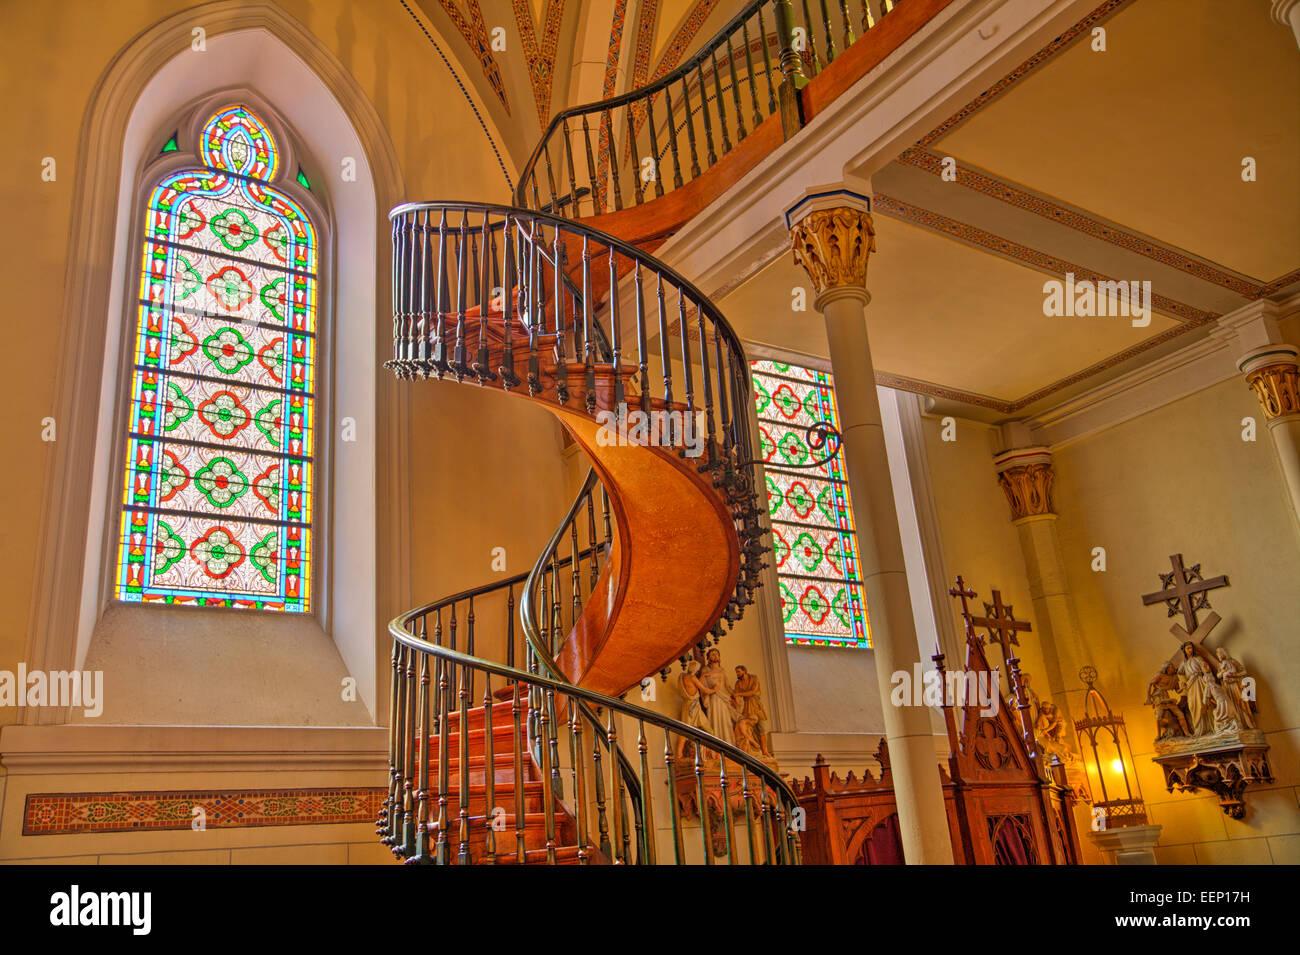 Spiral Staircase Loretto Chapel Santa Fe New Mexico Usa Stock Photo Alamy